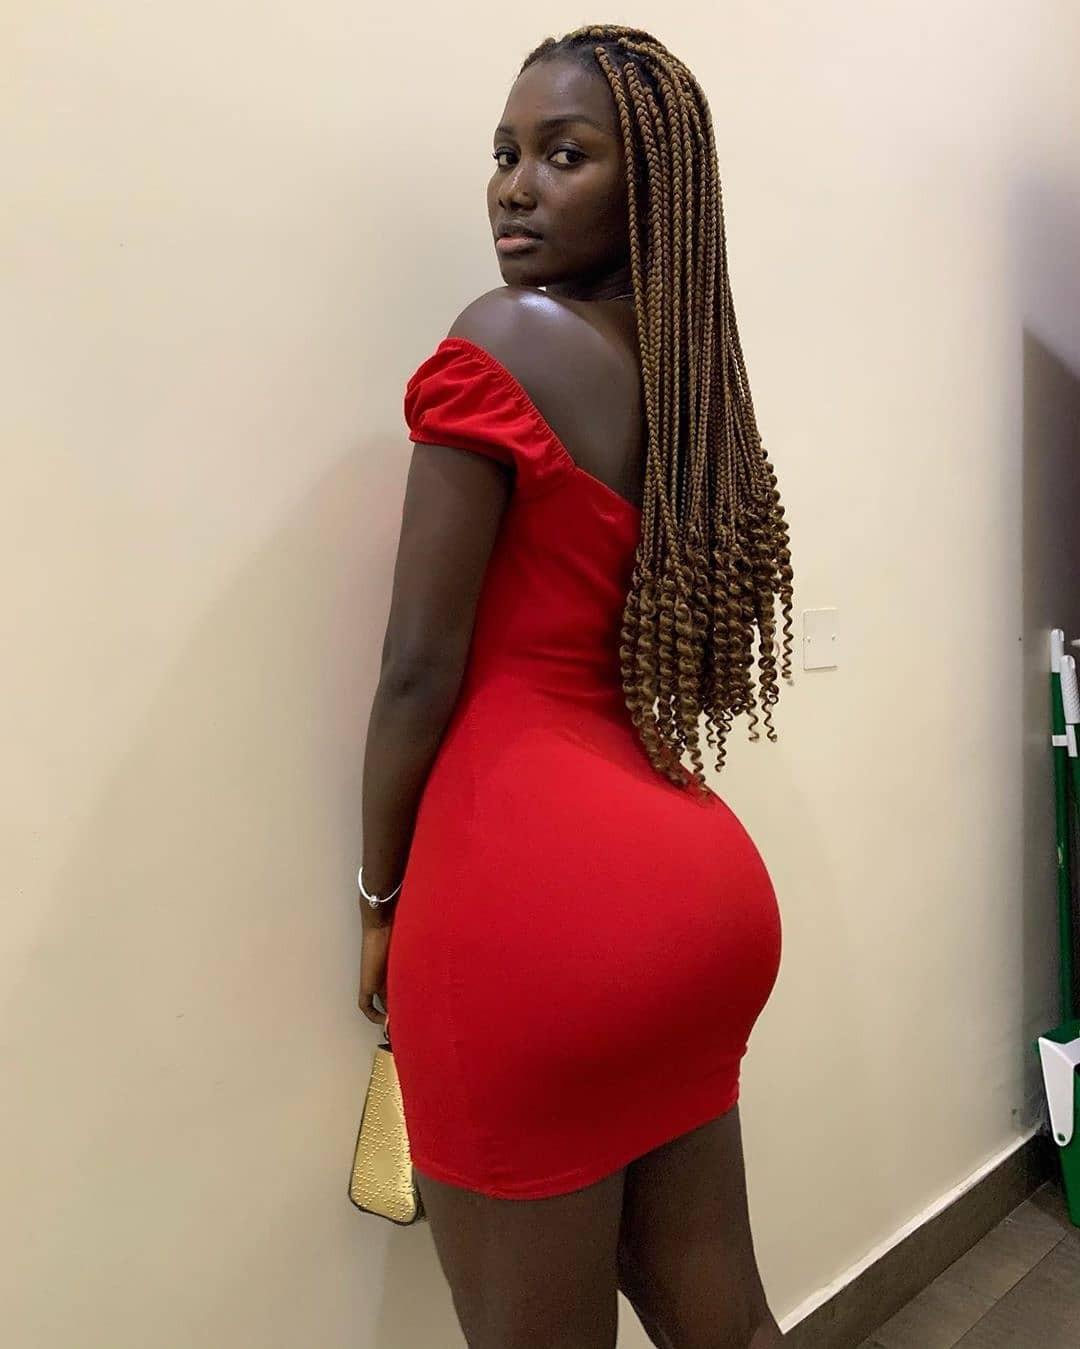 African Sexy Girls, Hôtel Sunugal, La beauté africaine